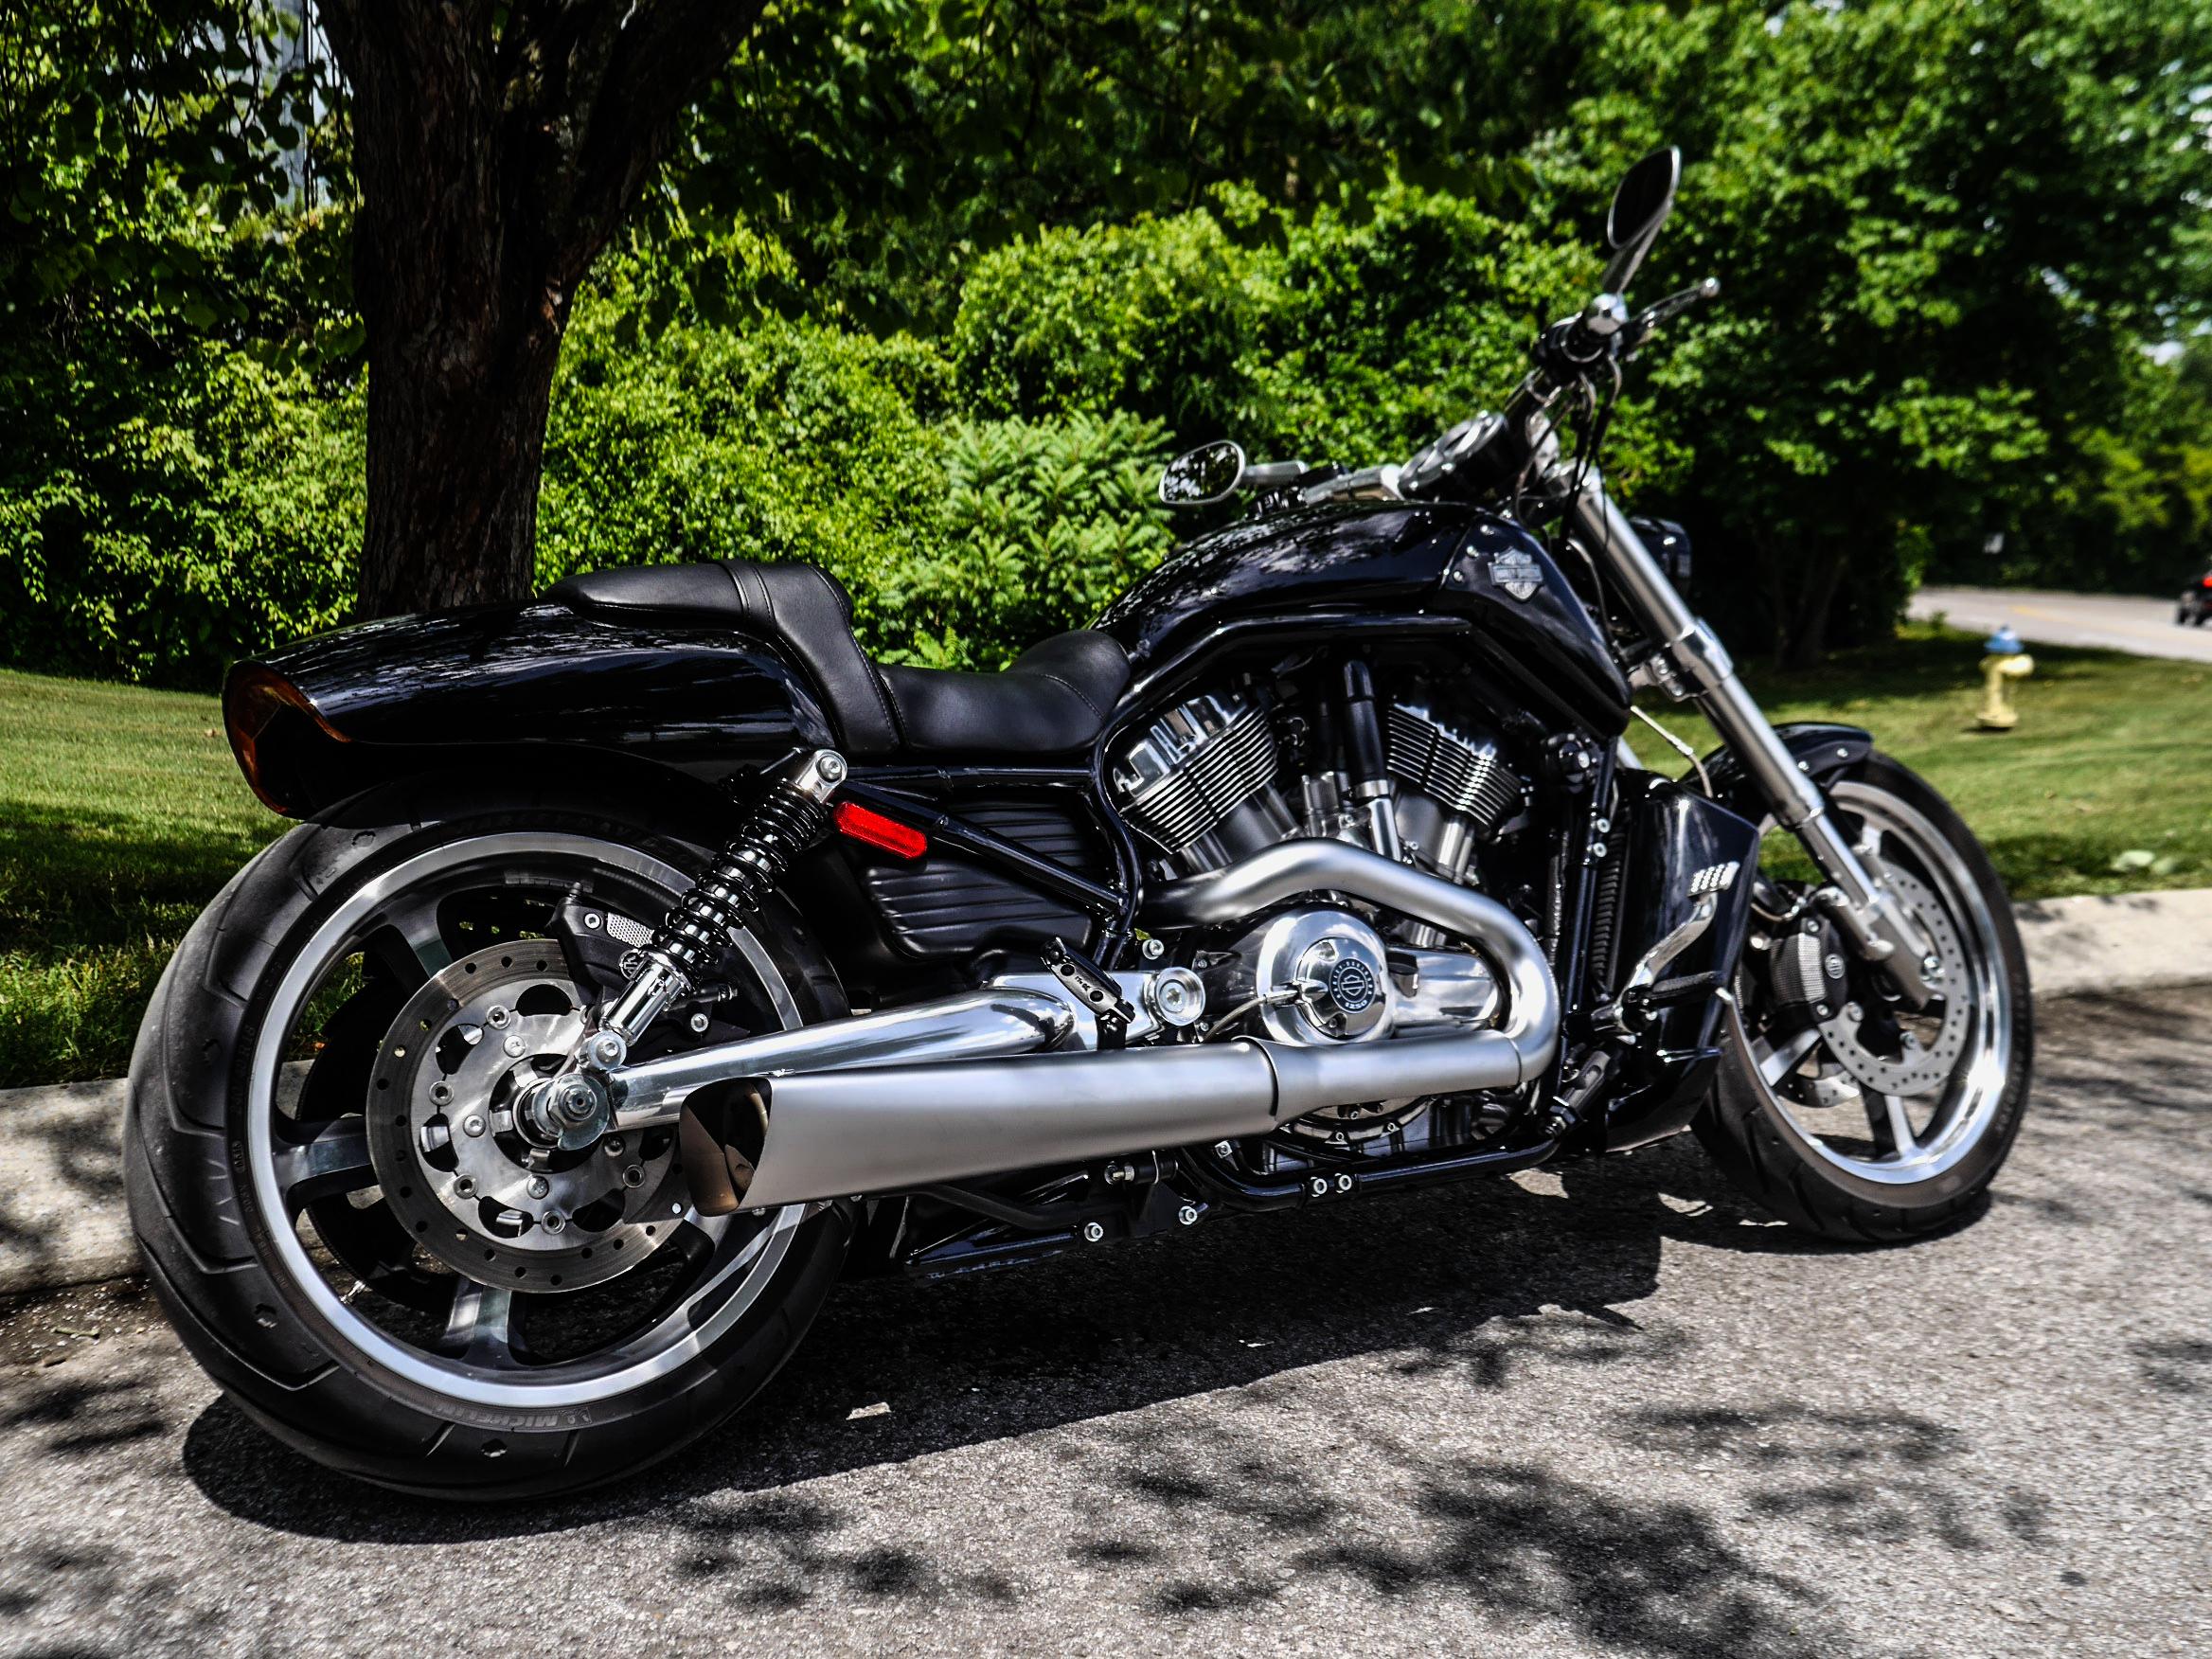 Pre-Owned 2015 Harley-Davidson V-Rod Muscle in Franklin # ...